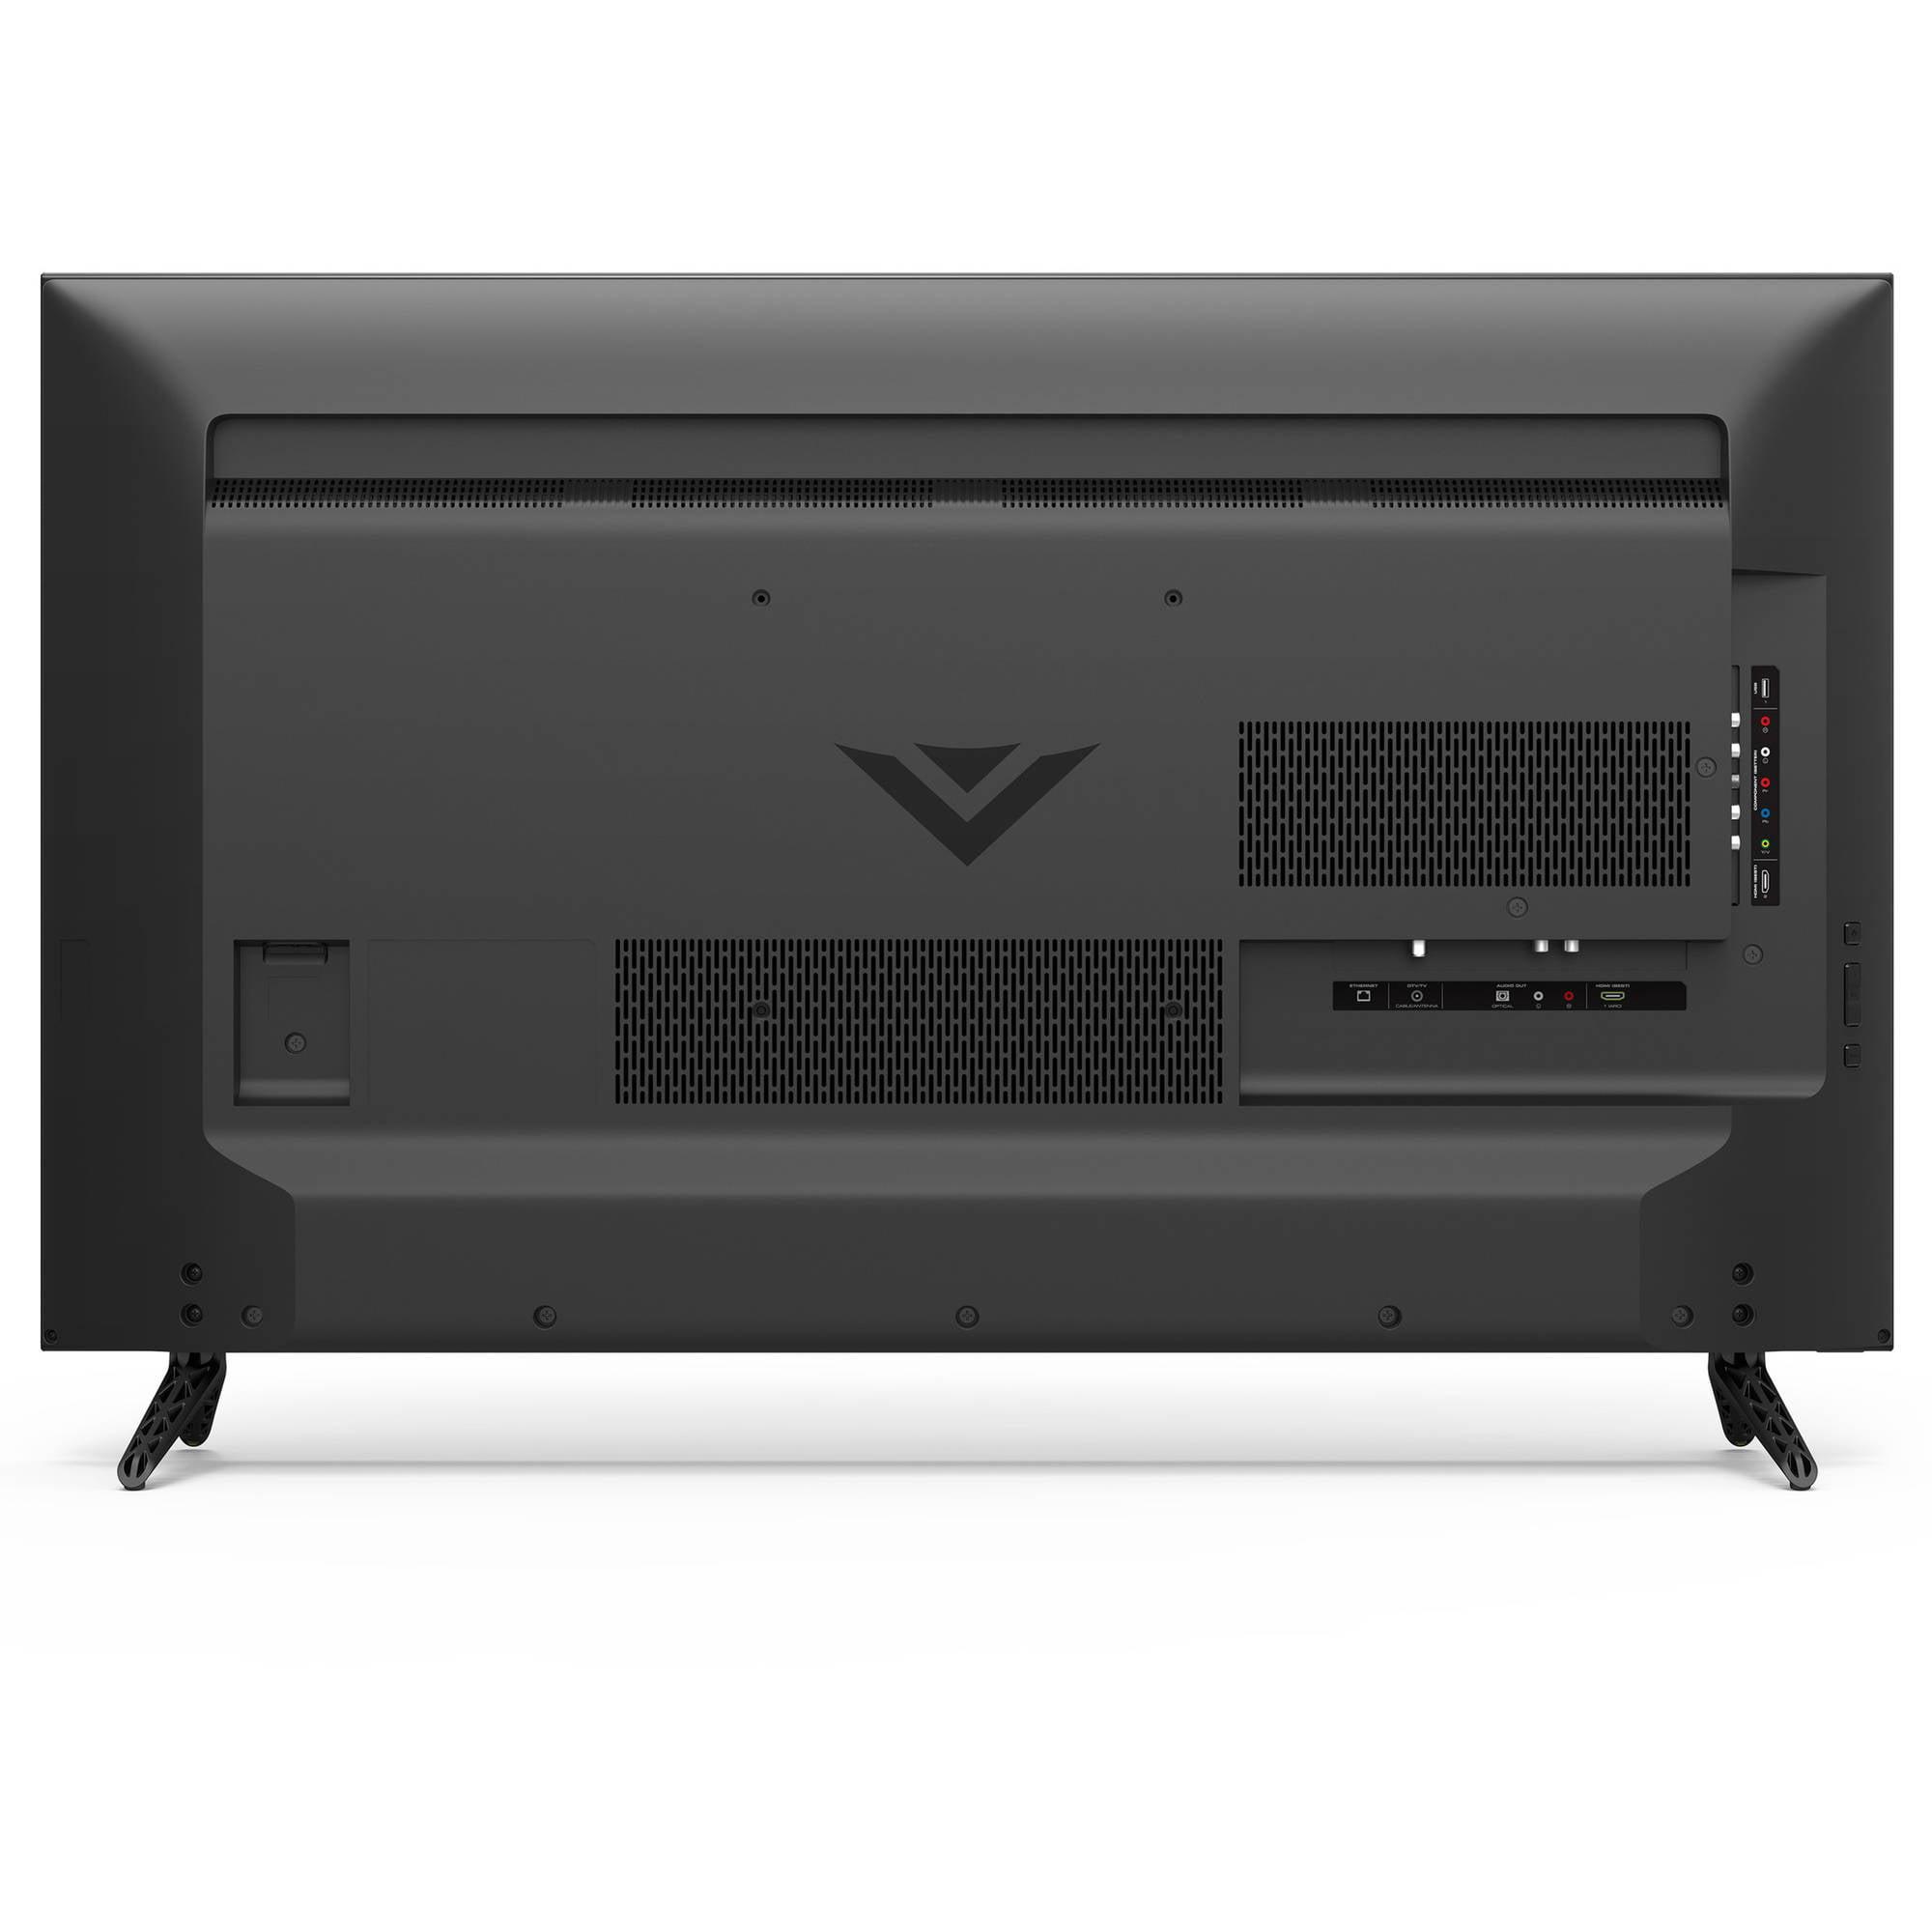 VIZIO VIZIO SMARTCAST ESERIES 40 CLASS 40 DIAG HDTV Walmartcom